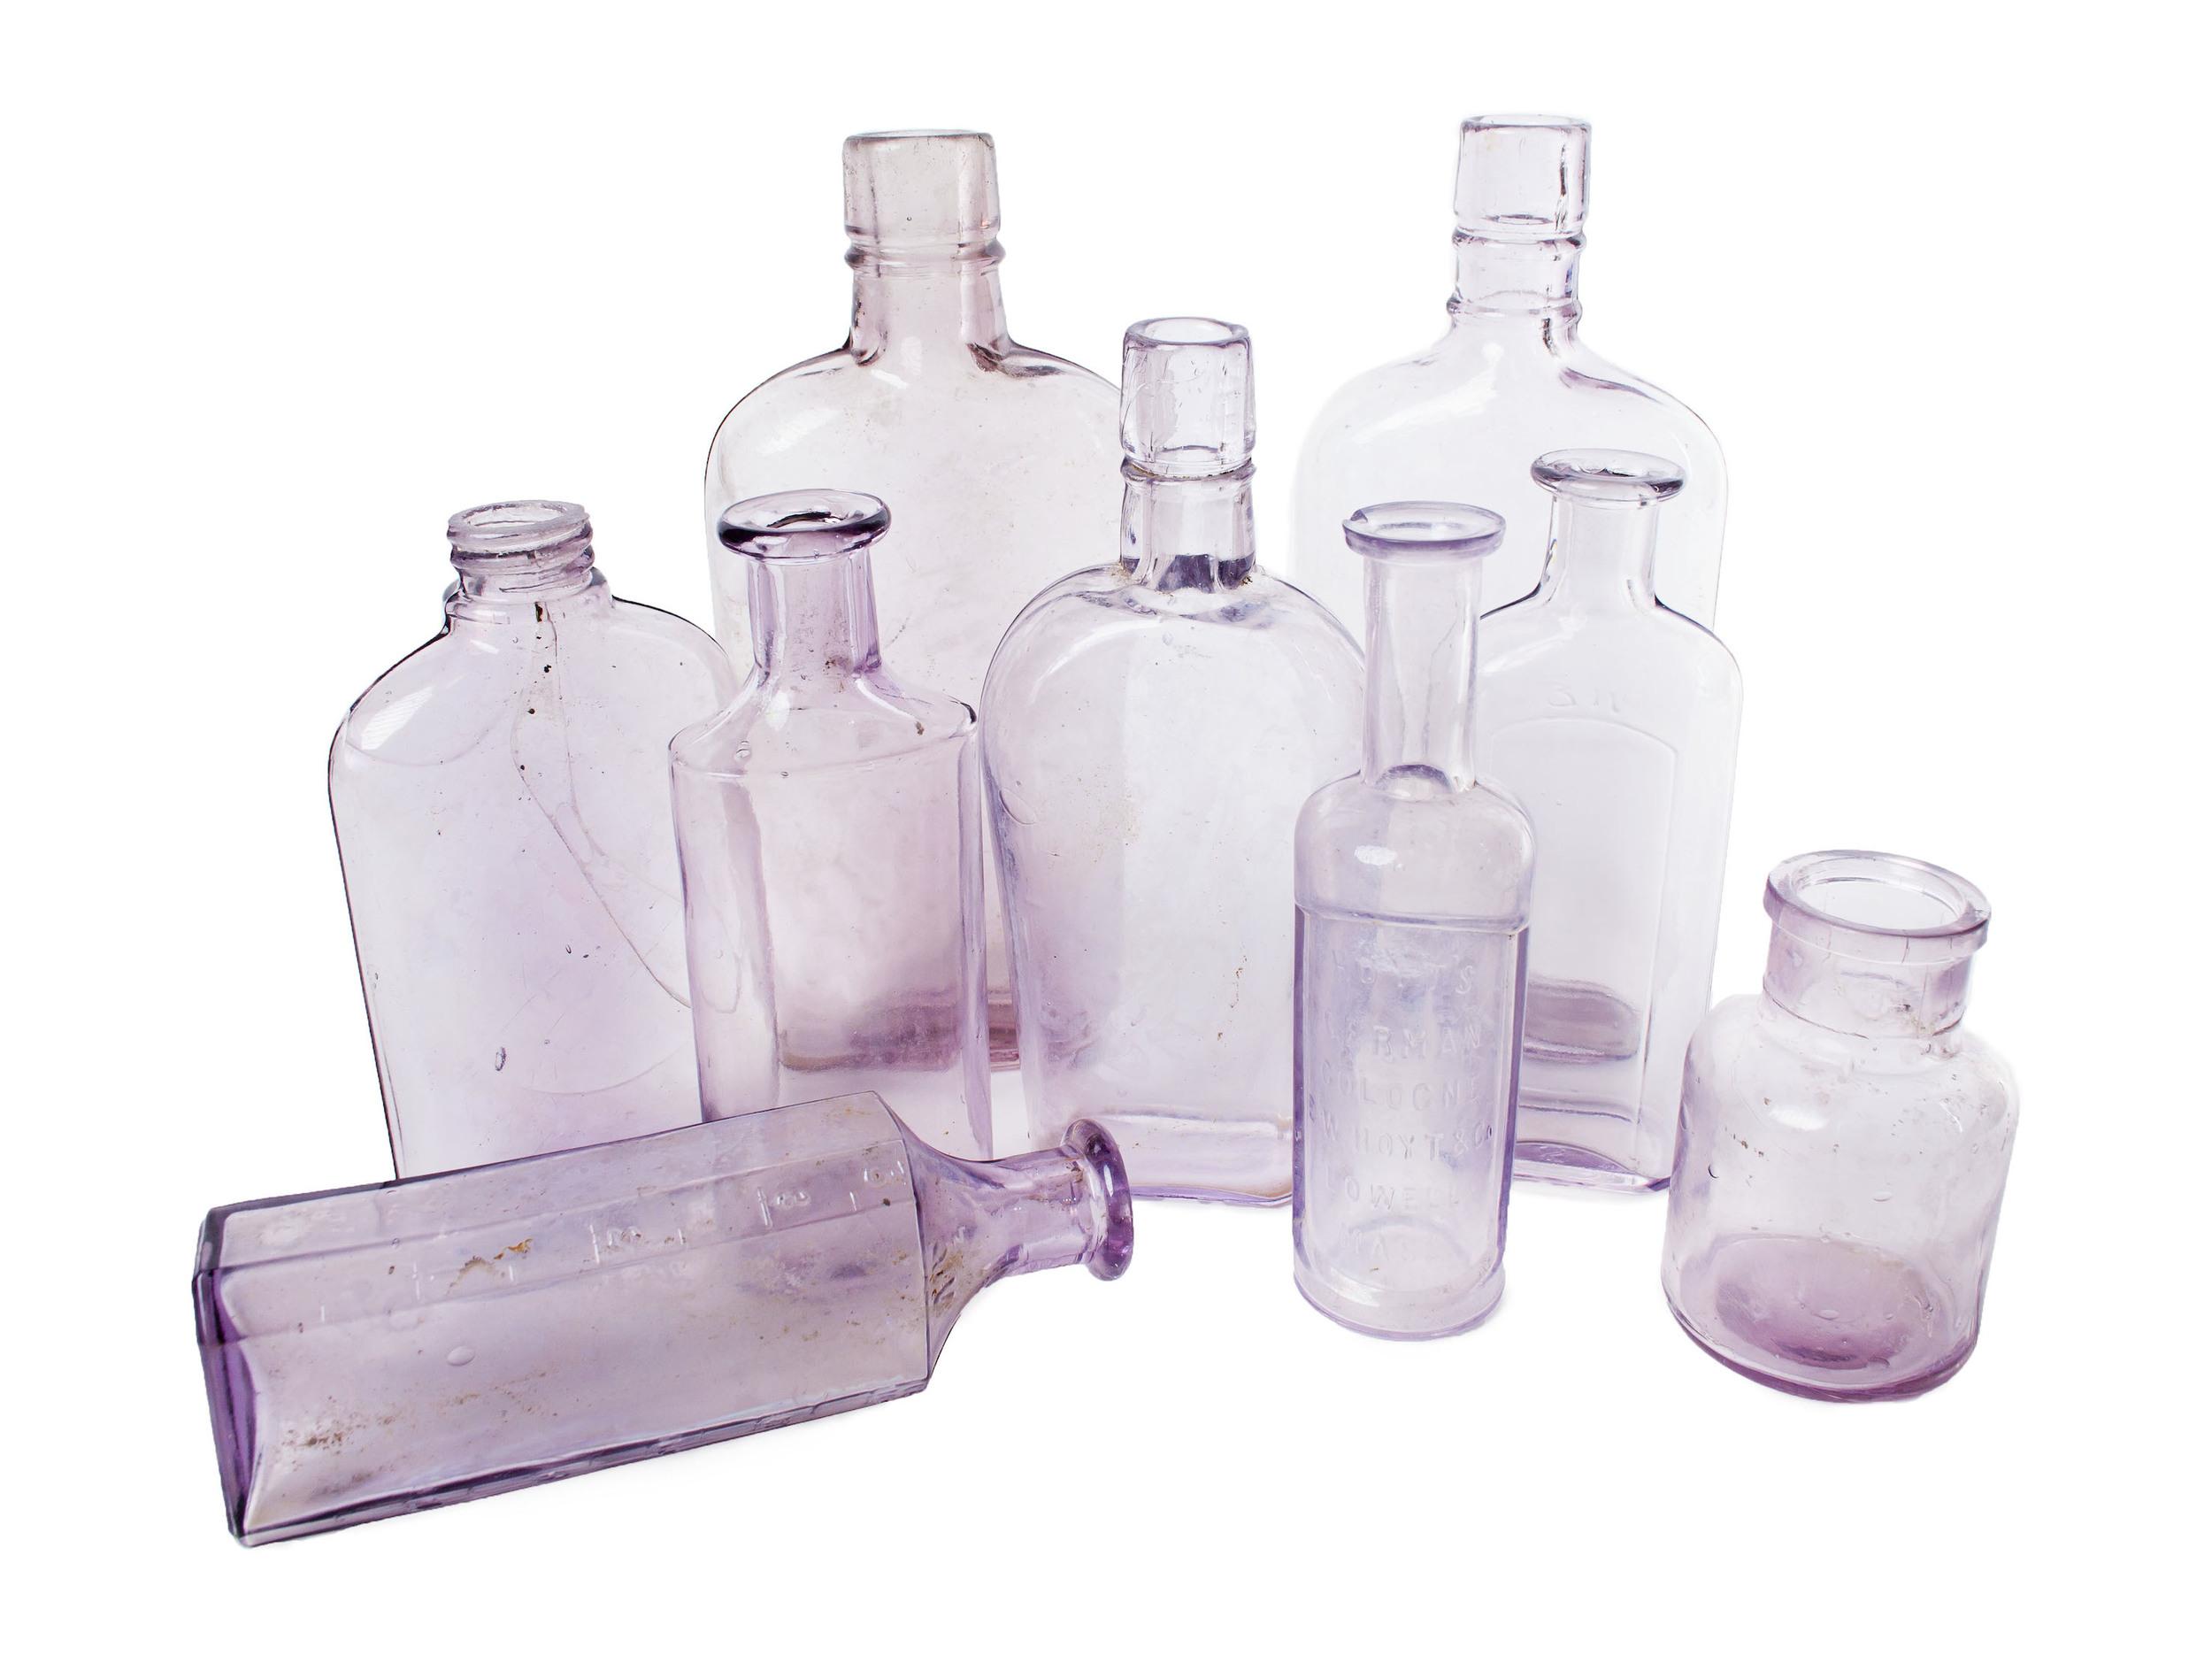 Antique - purple medicinal bottles